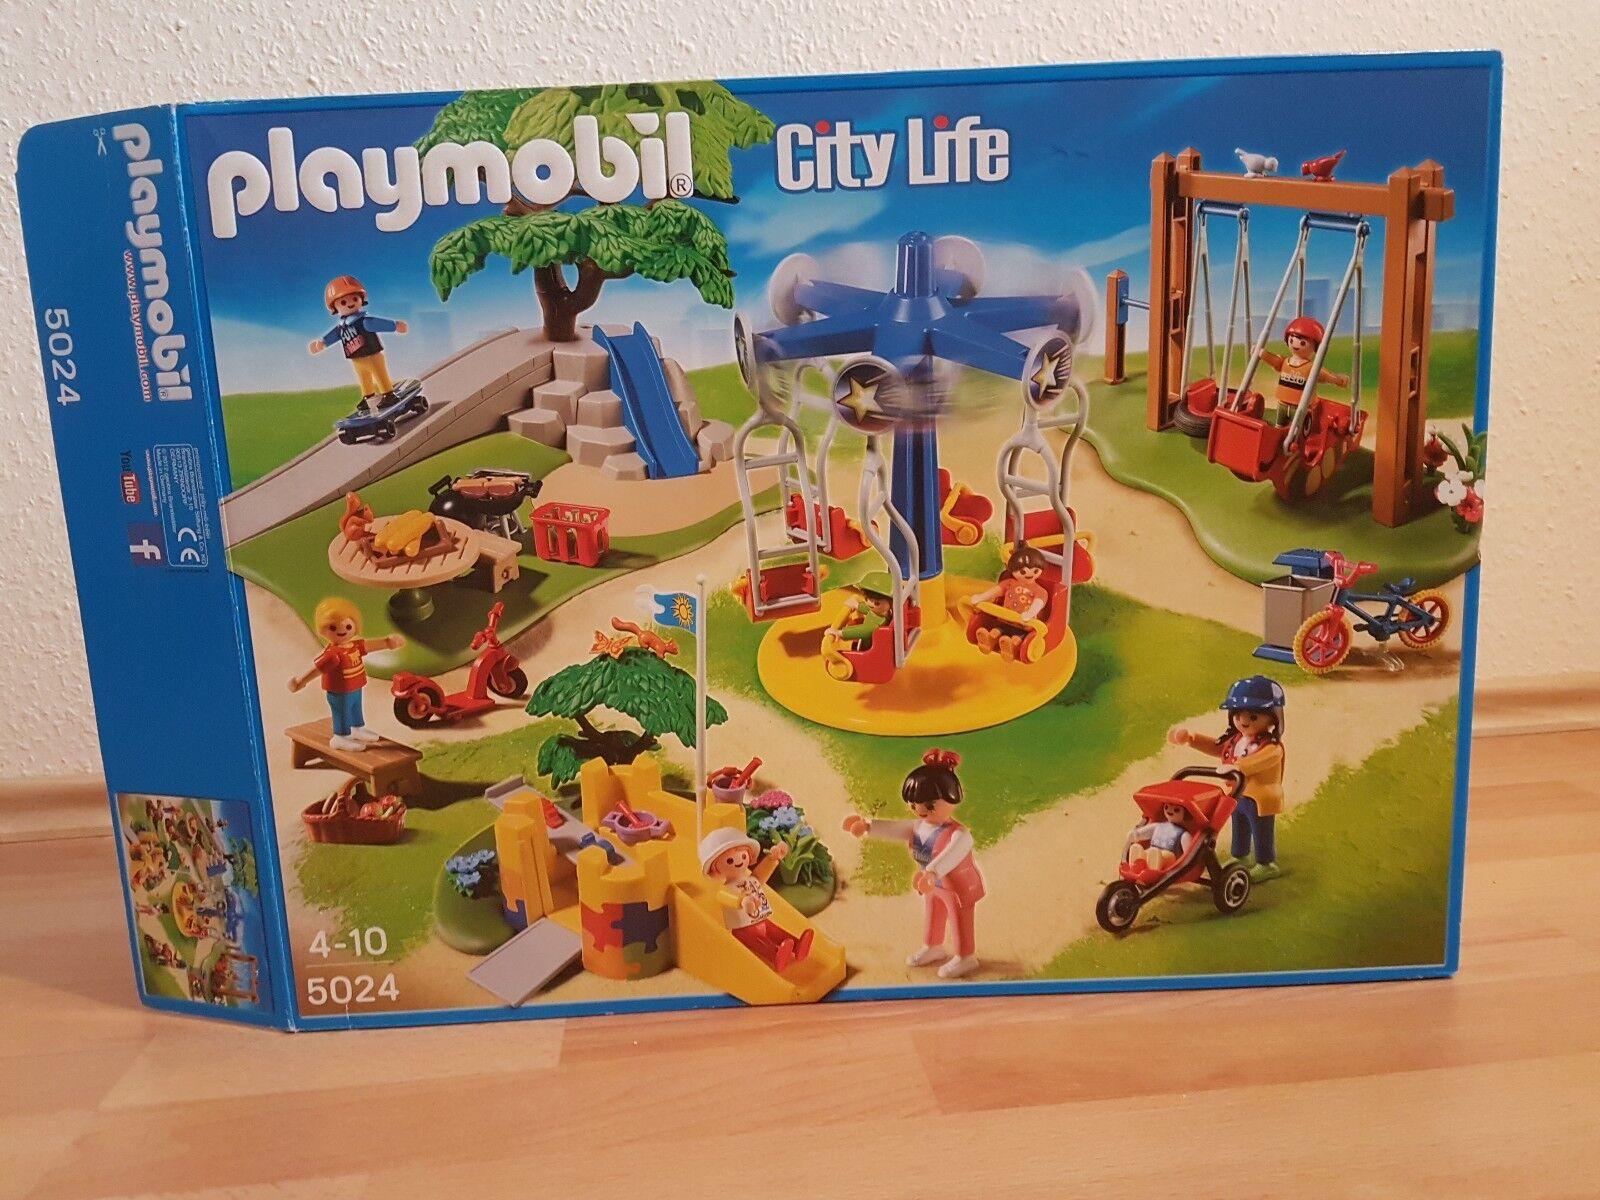 Playmobil 5024 Großer Kinderpielplatz City Life Karussell Schaukel Rutsche. OVP